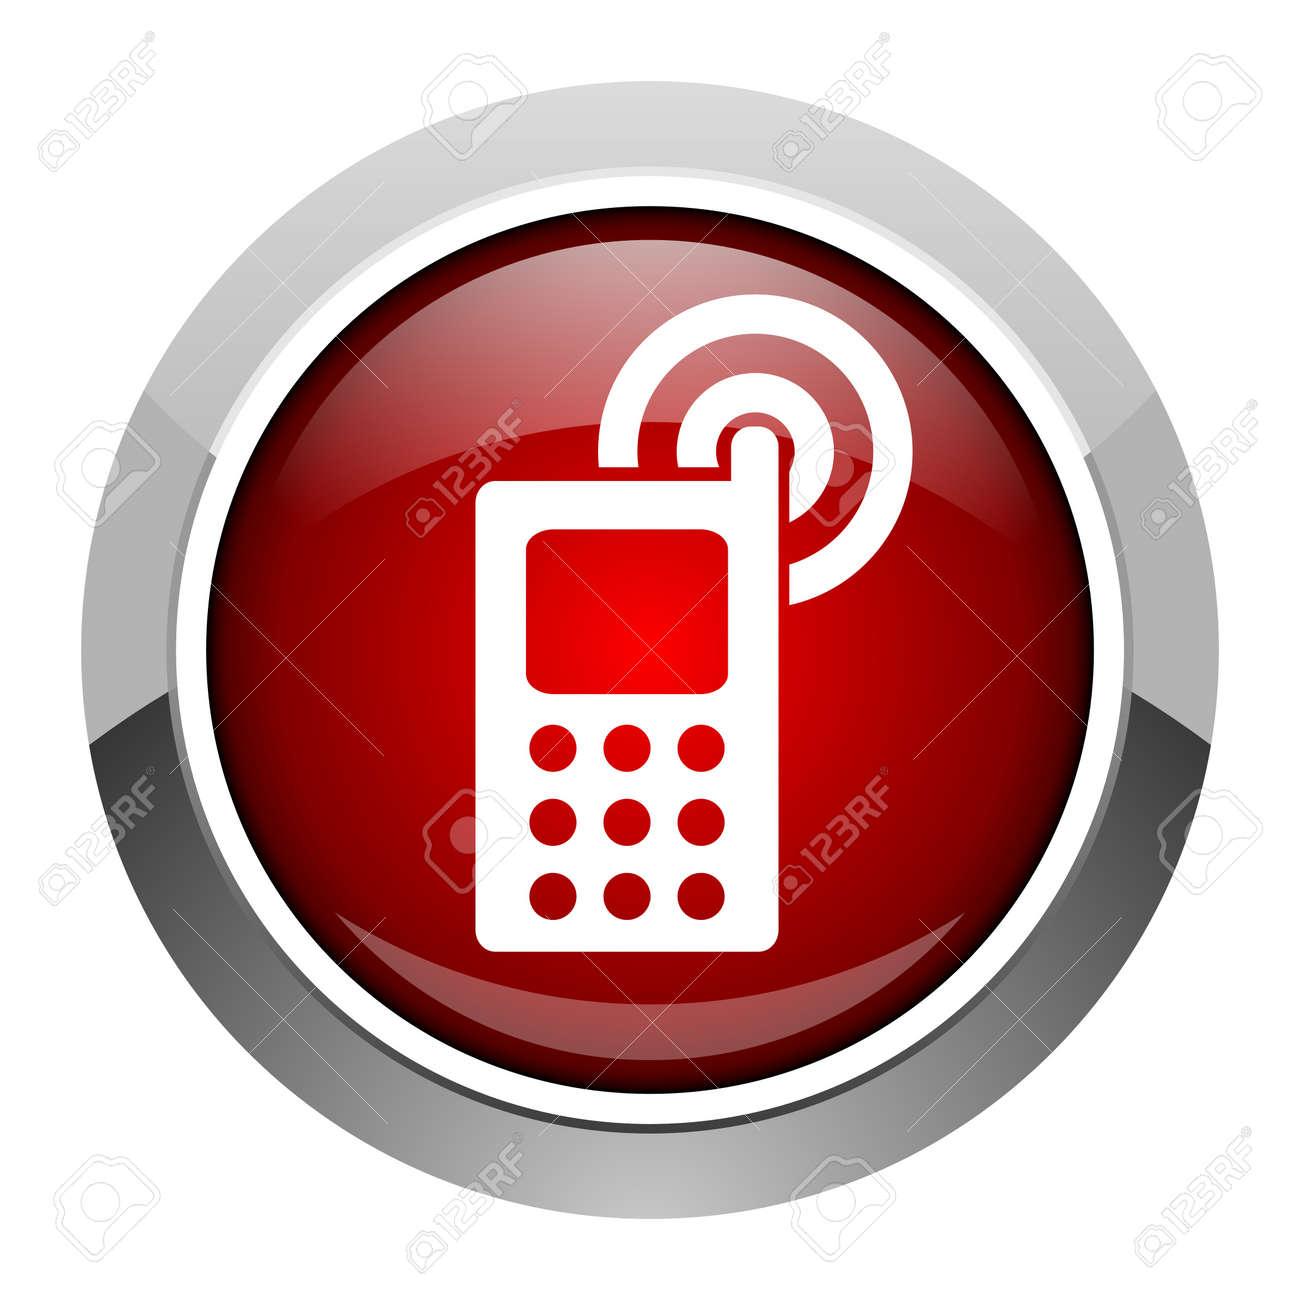 cellphone icon Stock Photo - 20206973